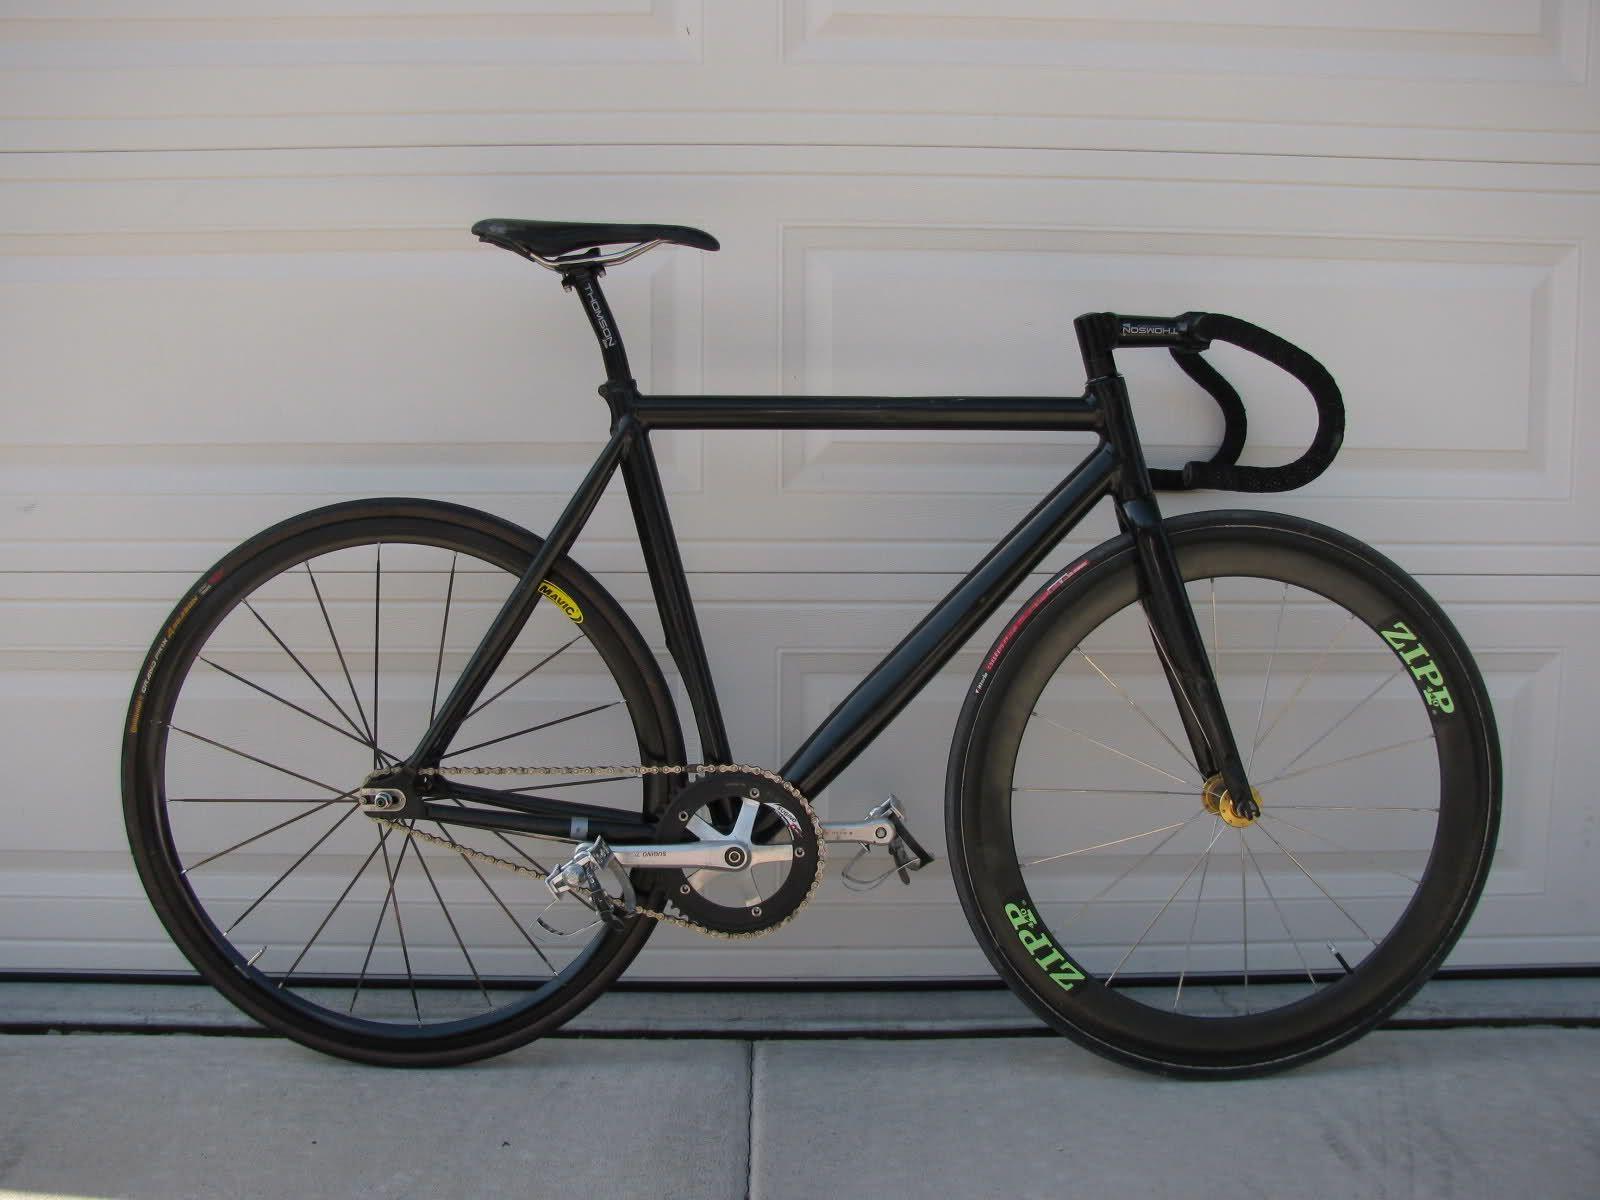 Bianchi Super Pista Black Bikes Fixed Gear Single